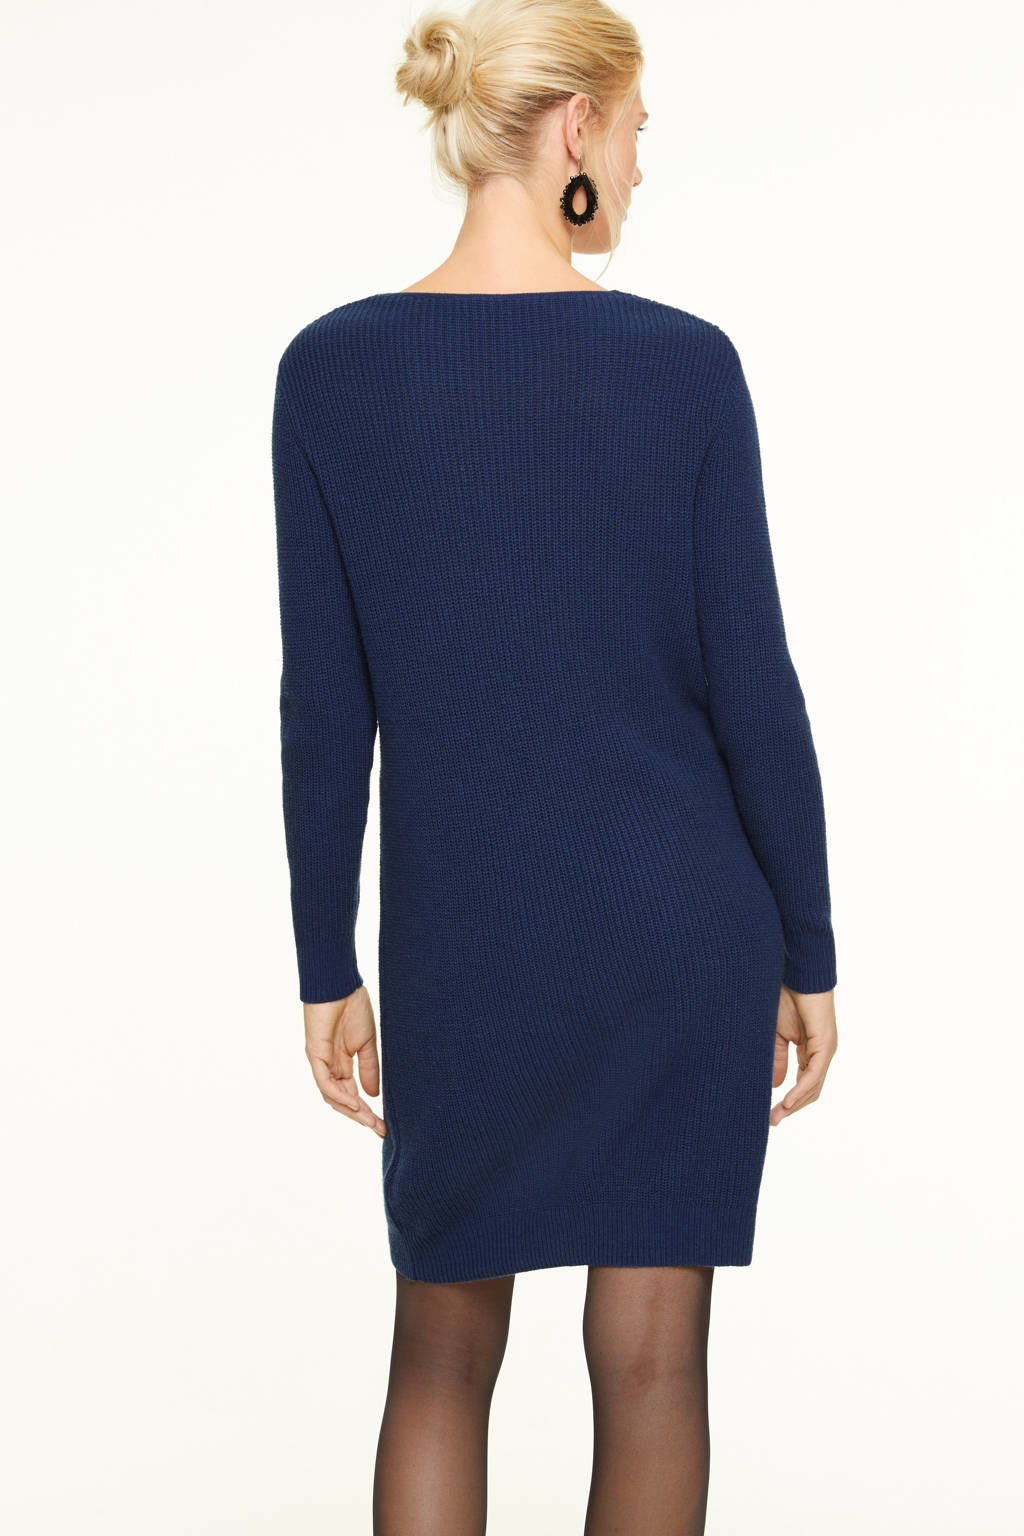 comma gebreide jurk donkerblauw, Donkerblauw